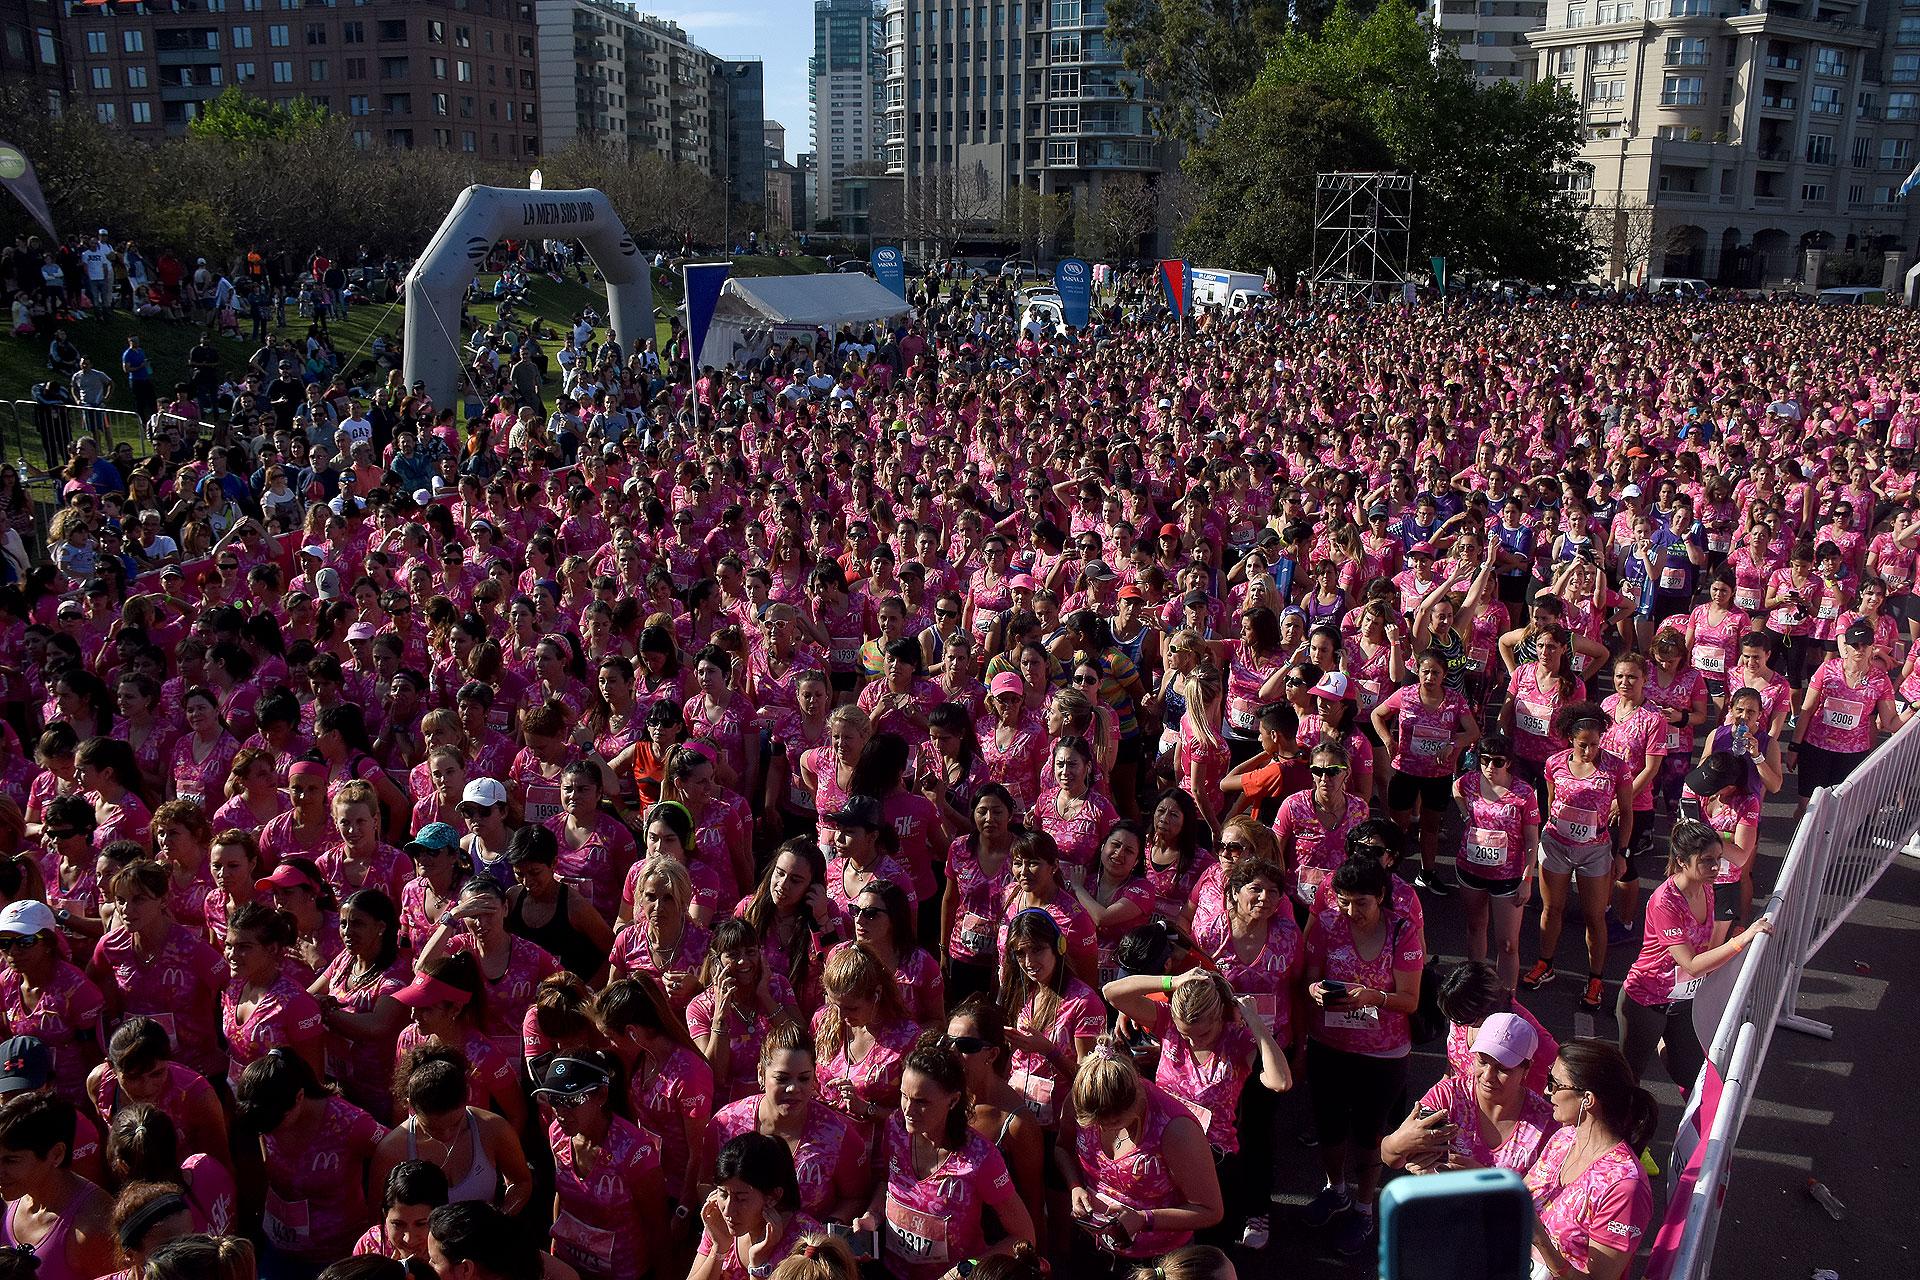 Muchas participantes se preparan para correr en un día espléndido